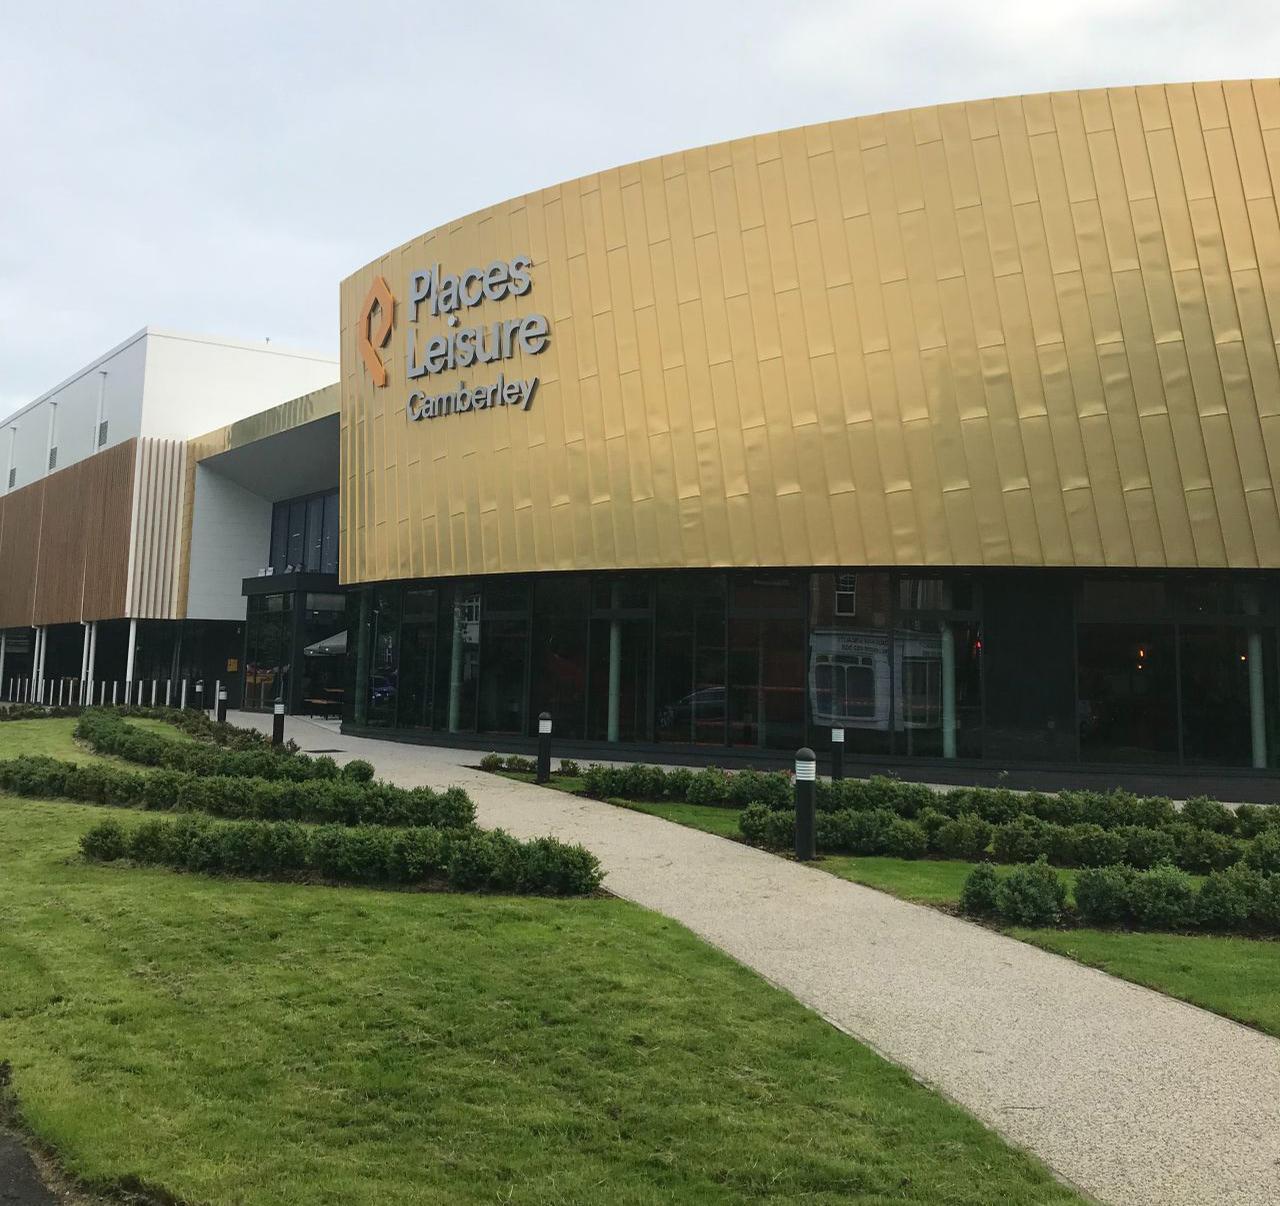 The £22m centre opened its doors on 1 July / LinkedIn/Dan Walker